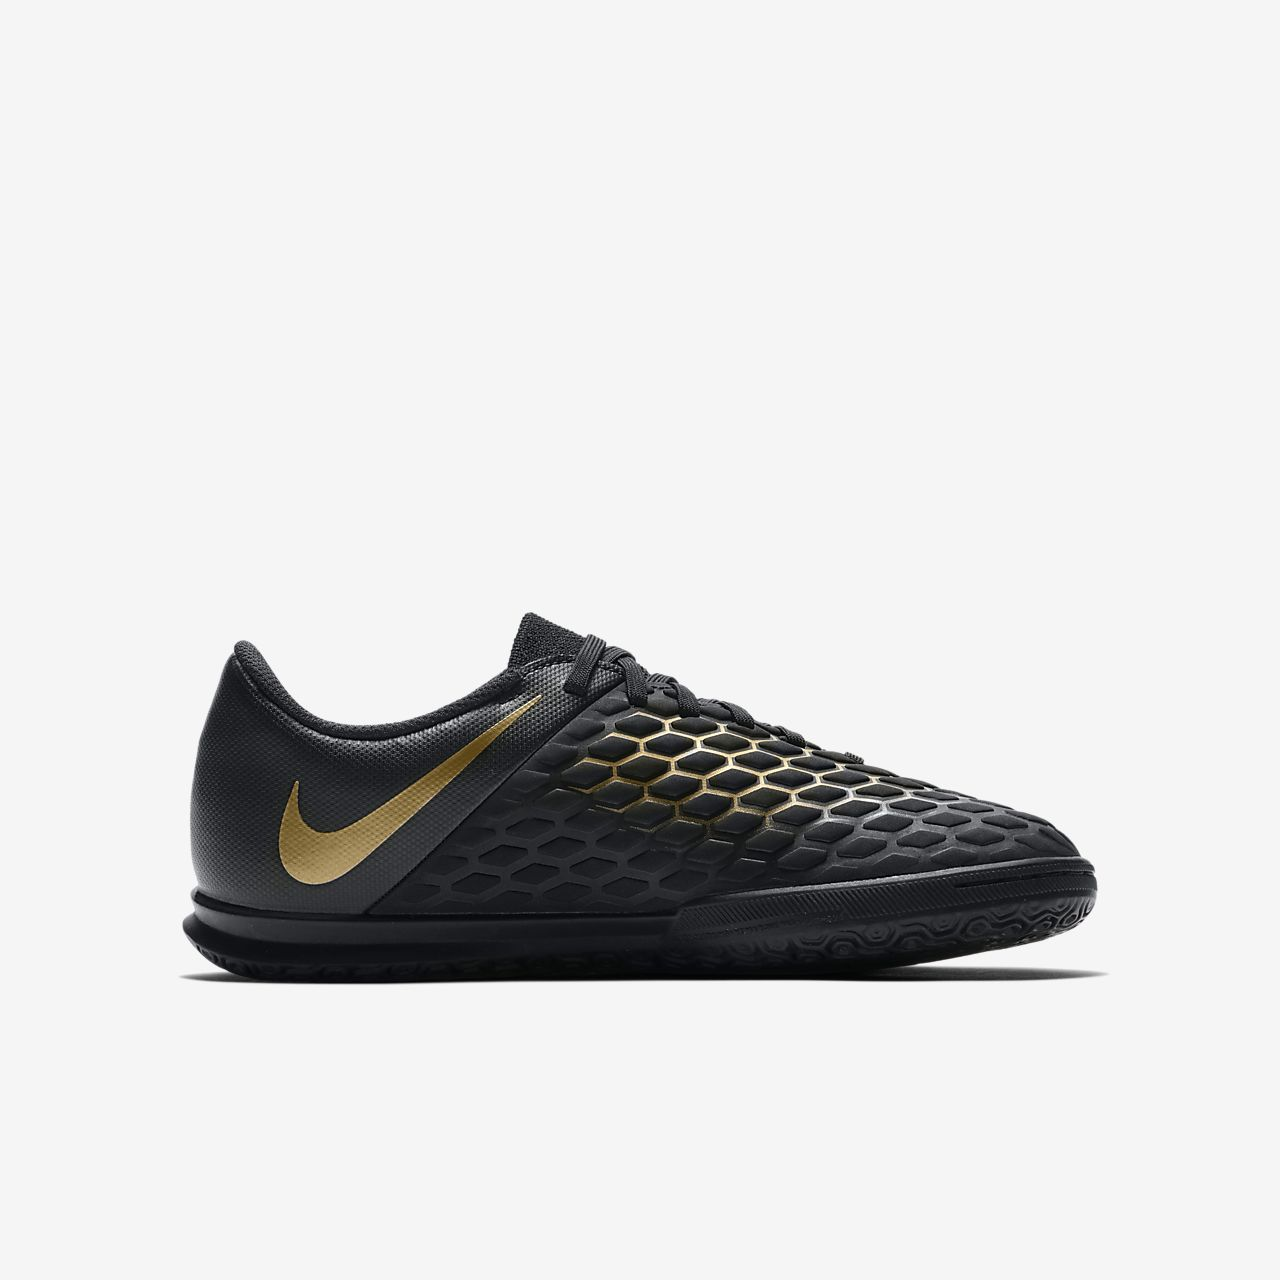 Nike Chaussures Hypervenomx Phantom Club TF Nike zxMbG7x